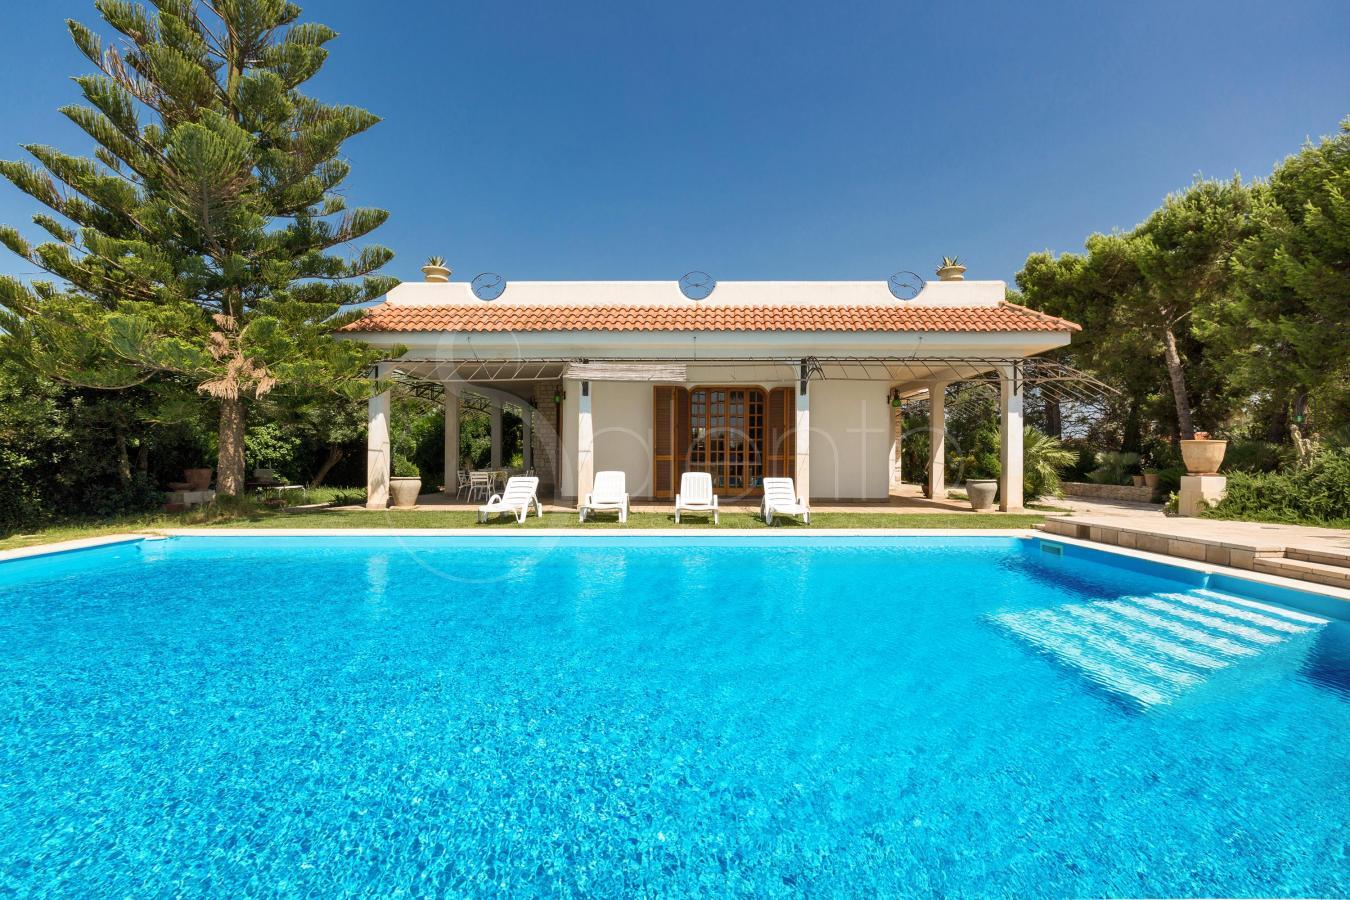 petites villas - Porto Cesareo - Villa Fortunato